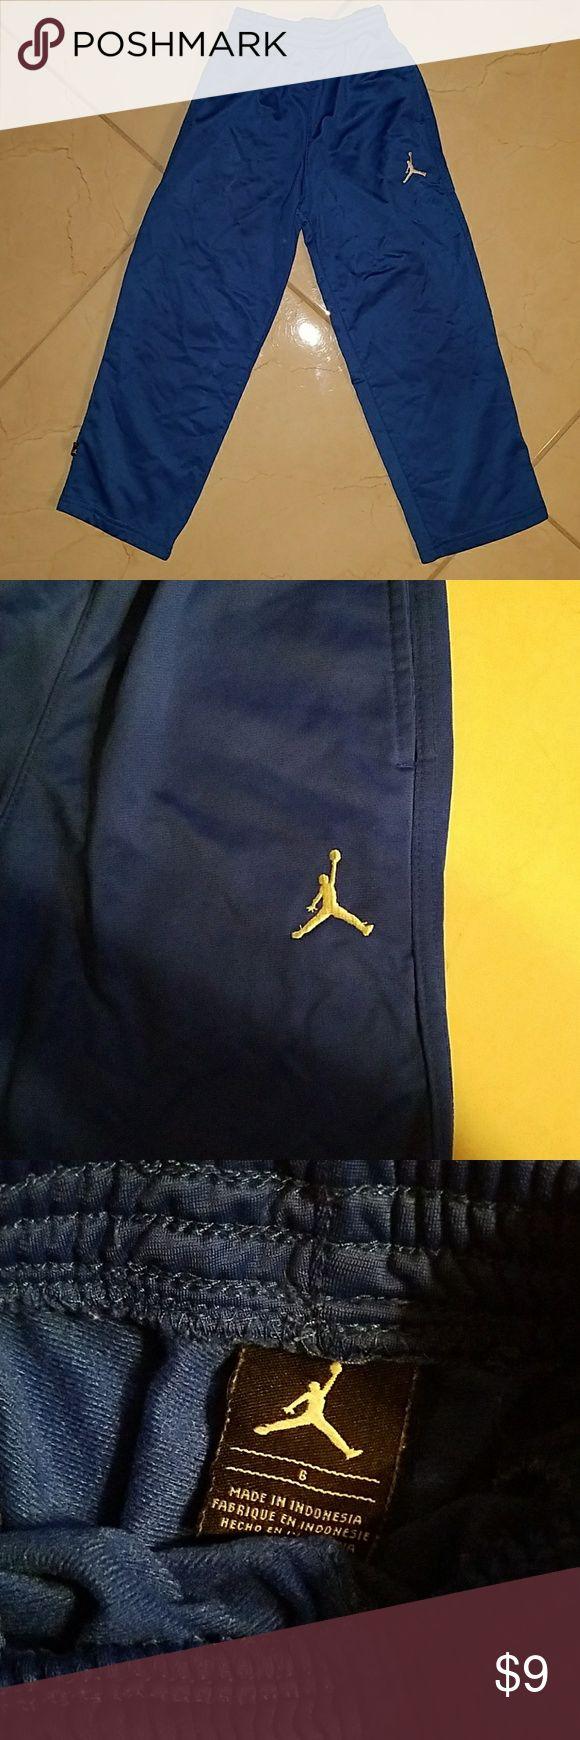 Jordan Sweat pants In good condition and very warm... Jordan Bottoms Sweatpants & Joggers